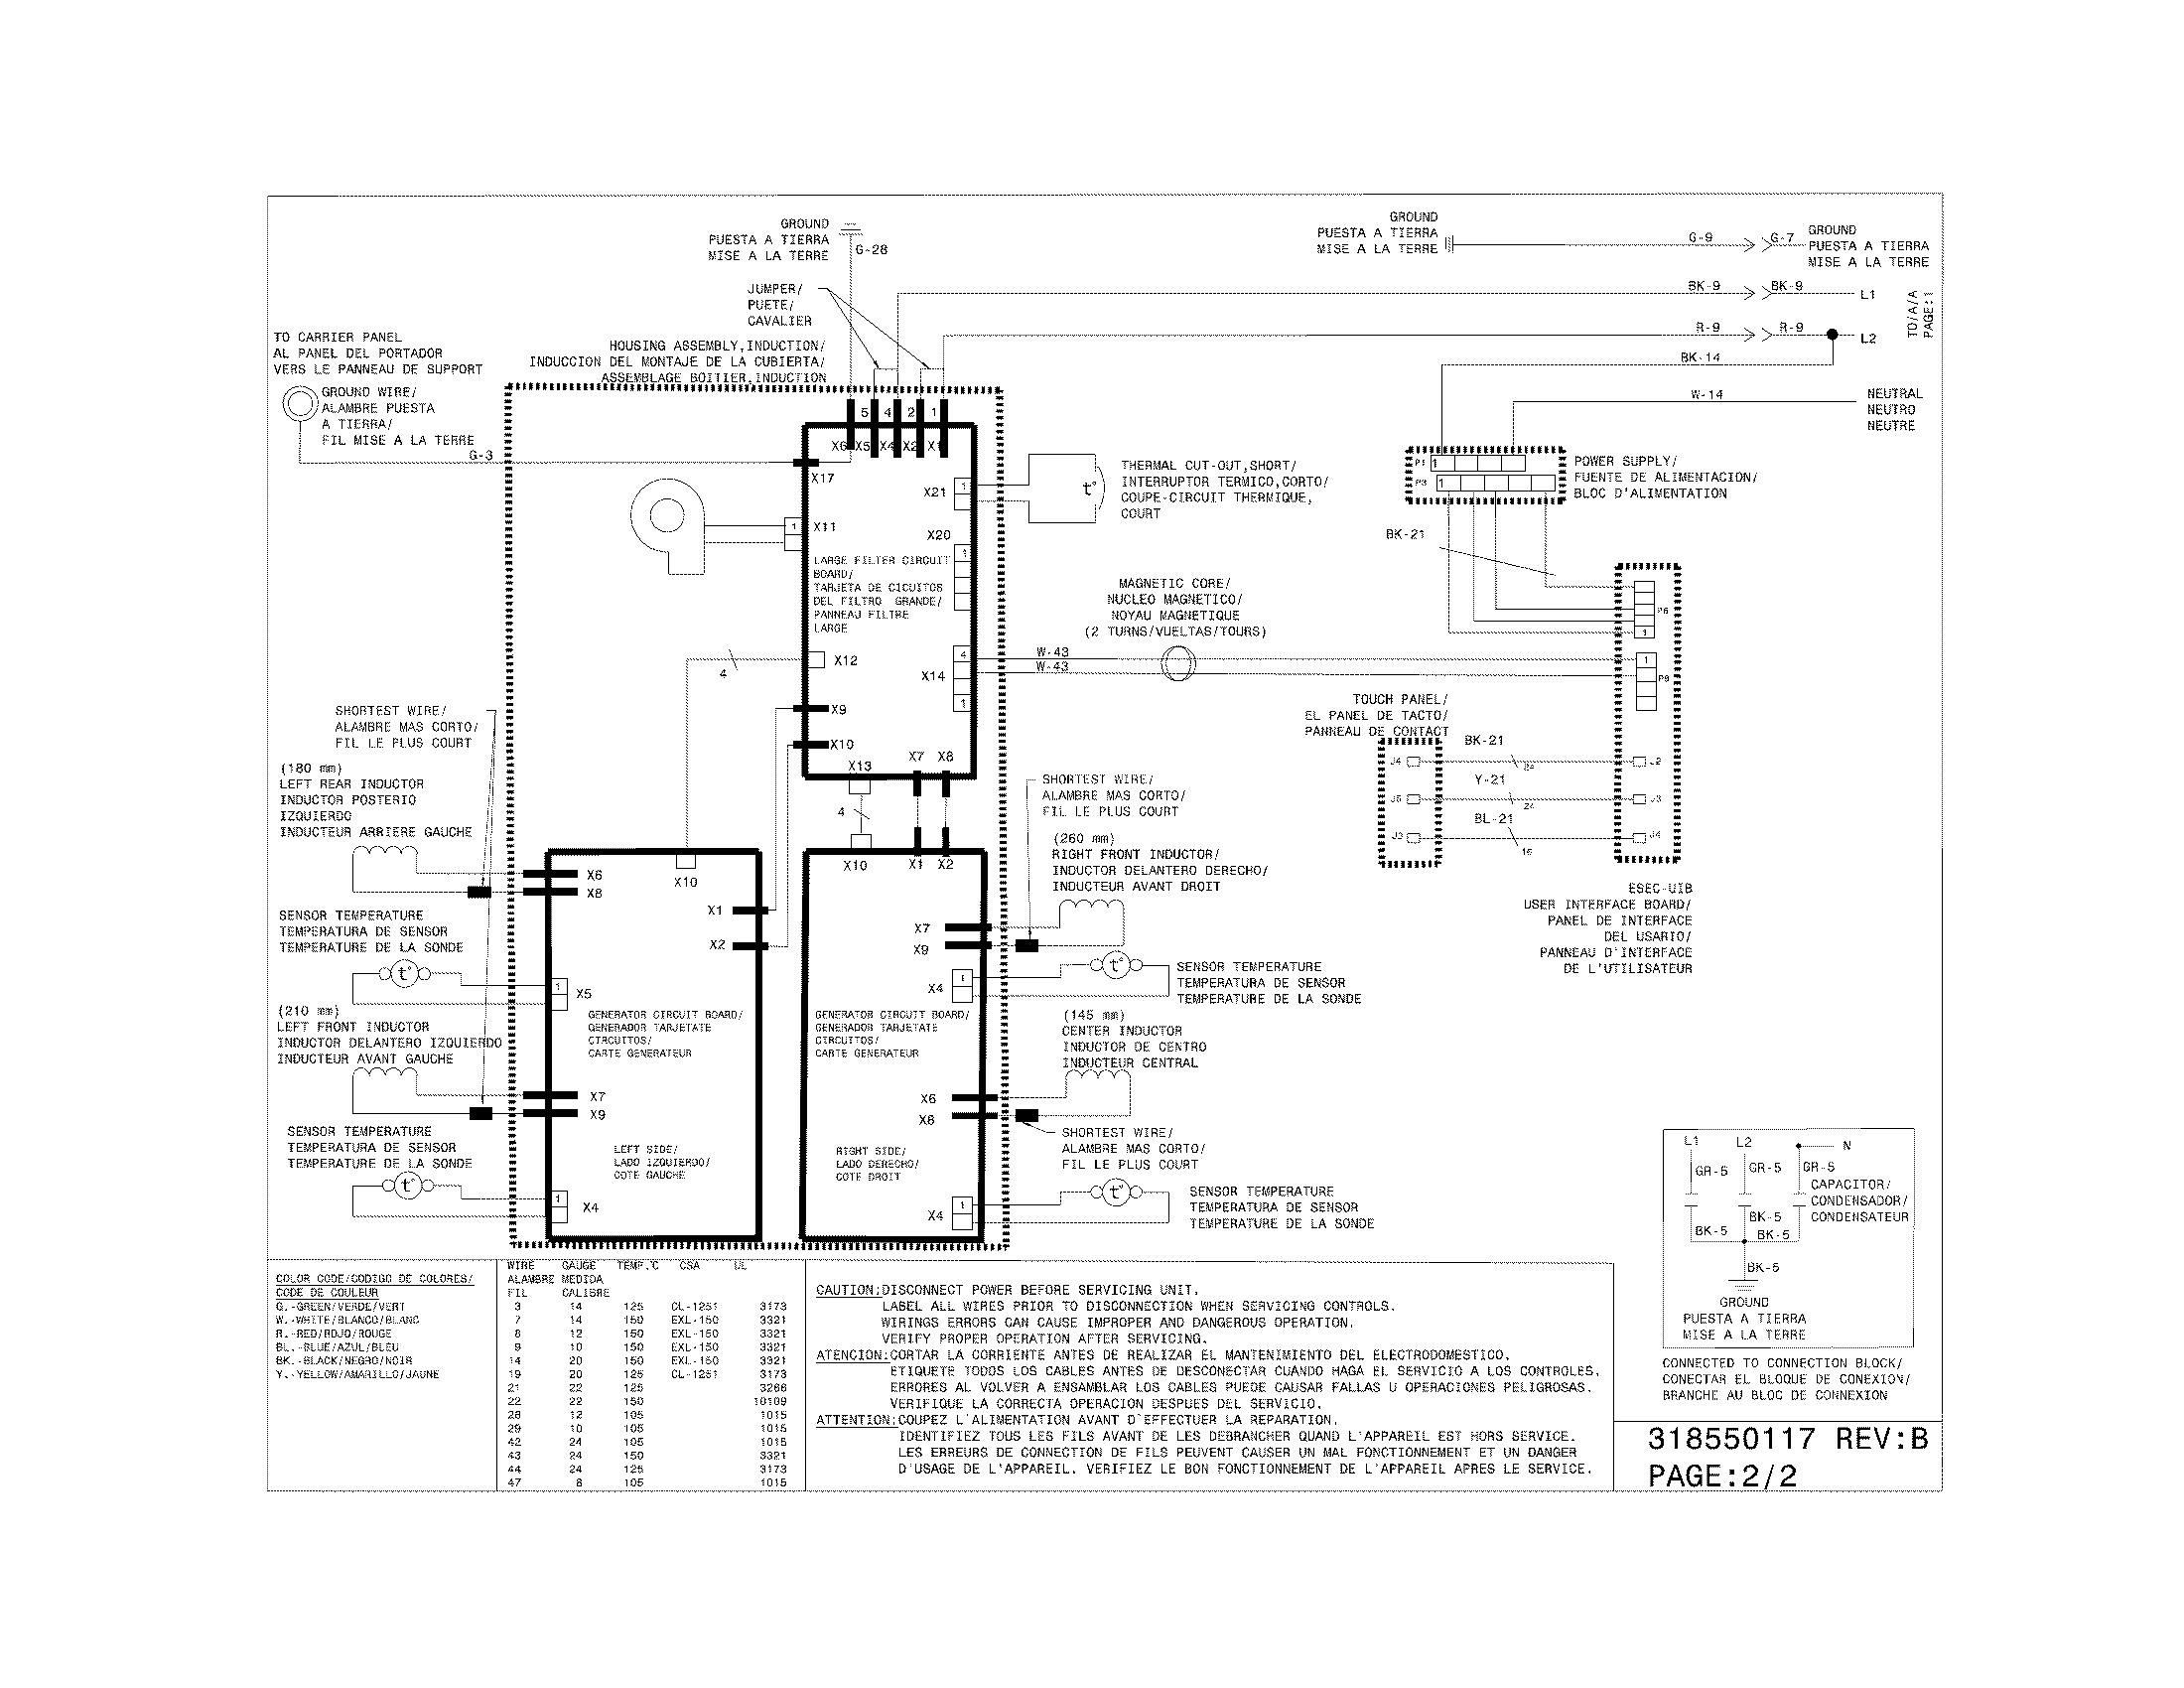 1995 Prowler Travel Trailer Wiring Diagram Prowler Travel